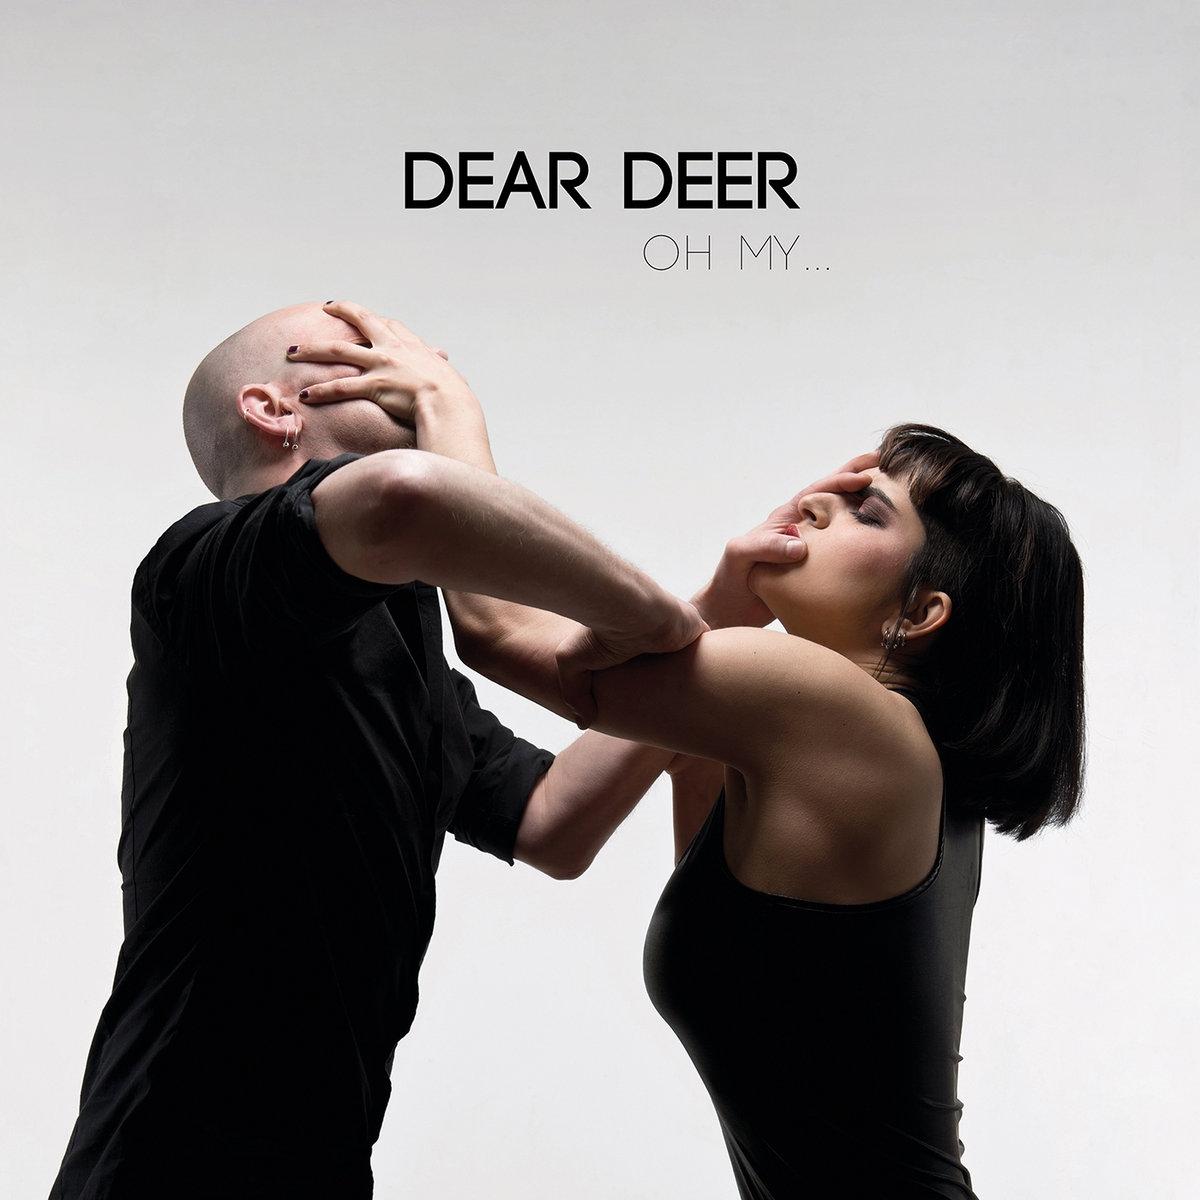 Dear Deer, Oh My...